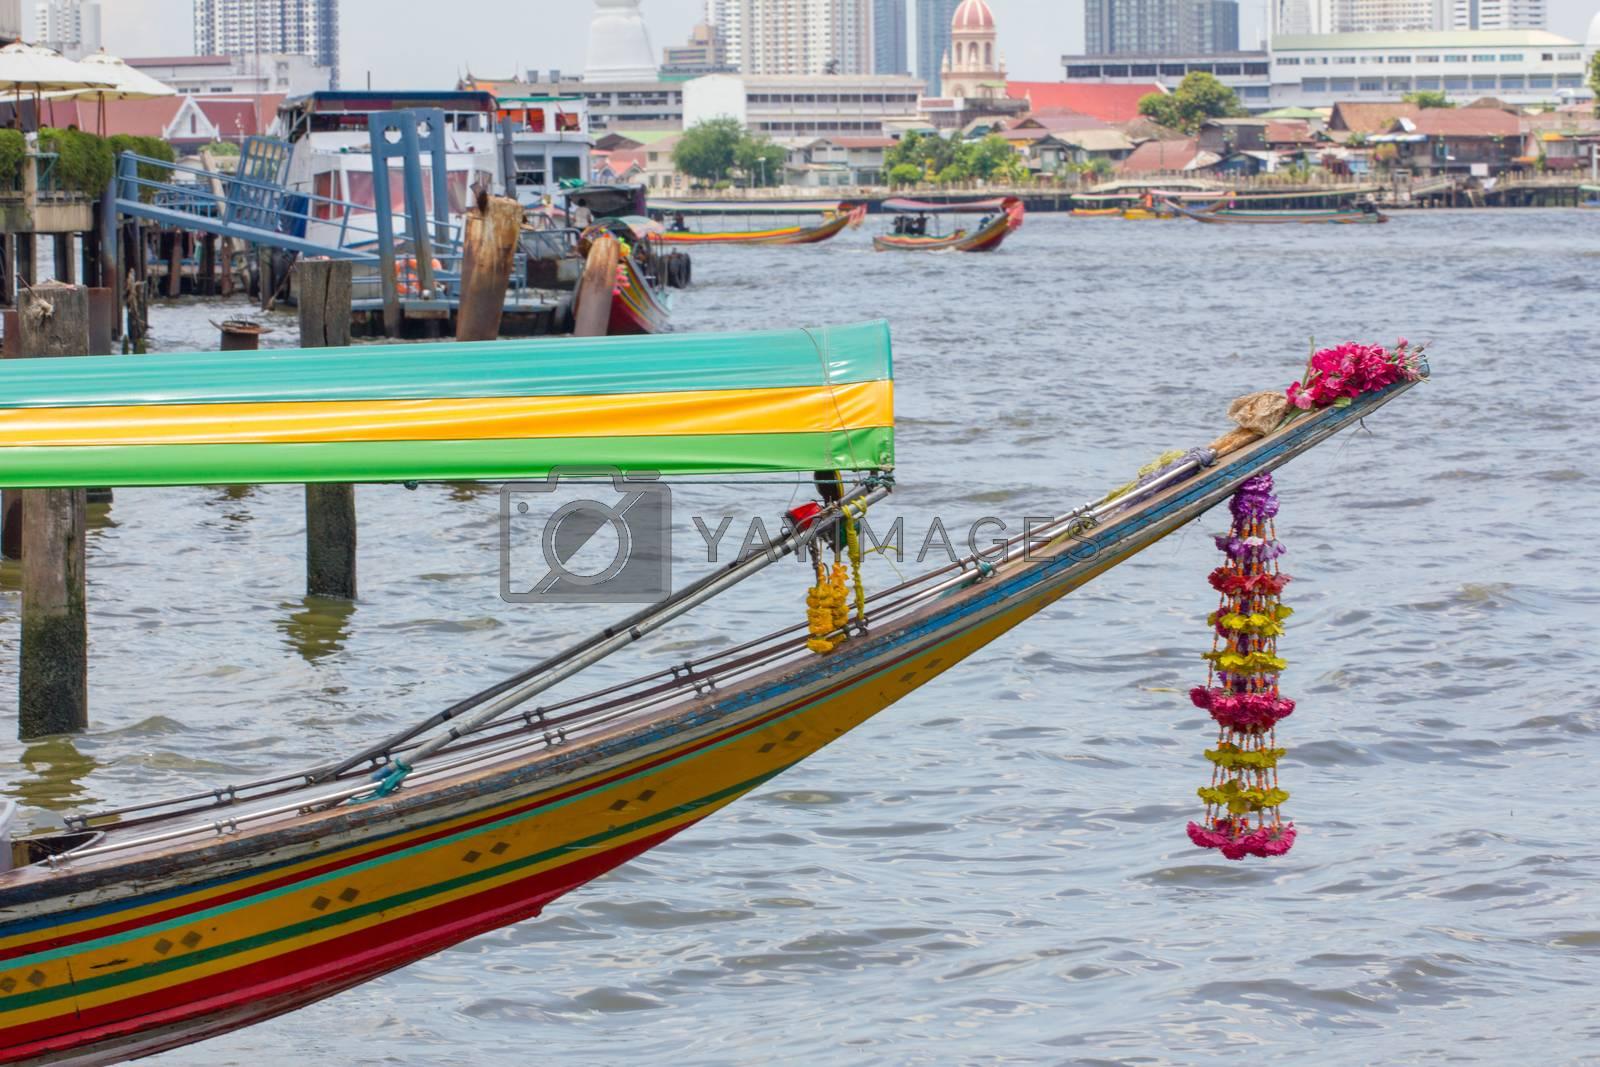 head of passenger ship at harbor, chao phraya river, thailand